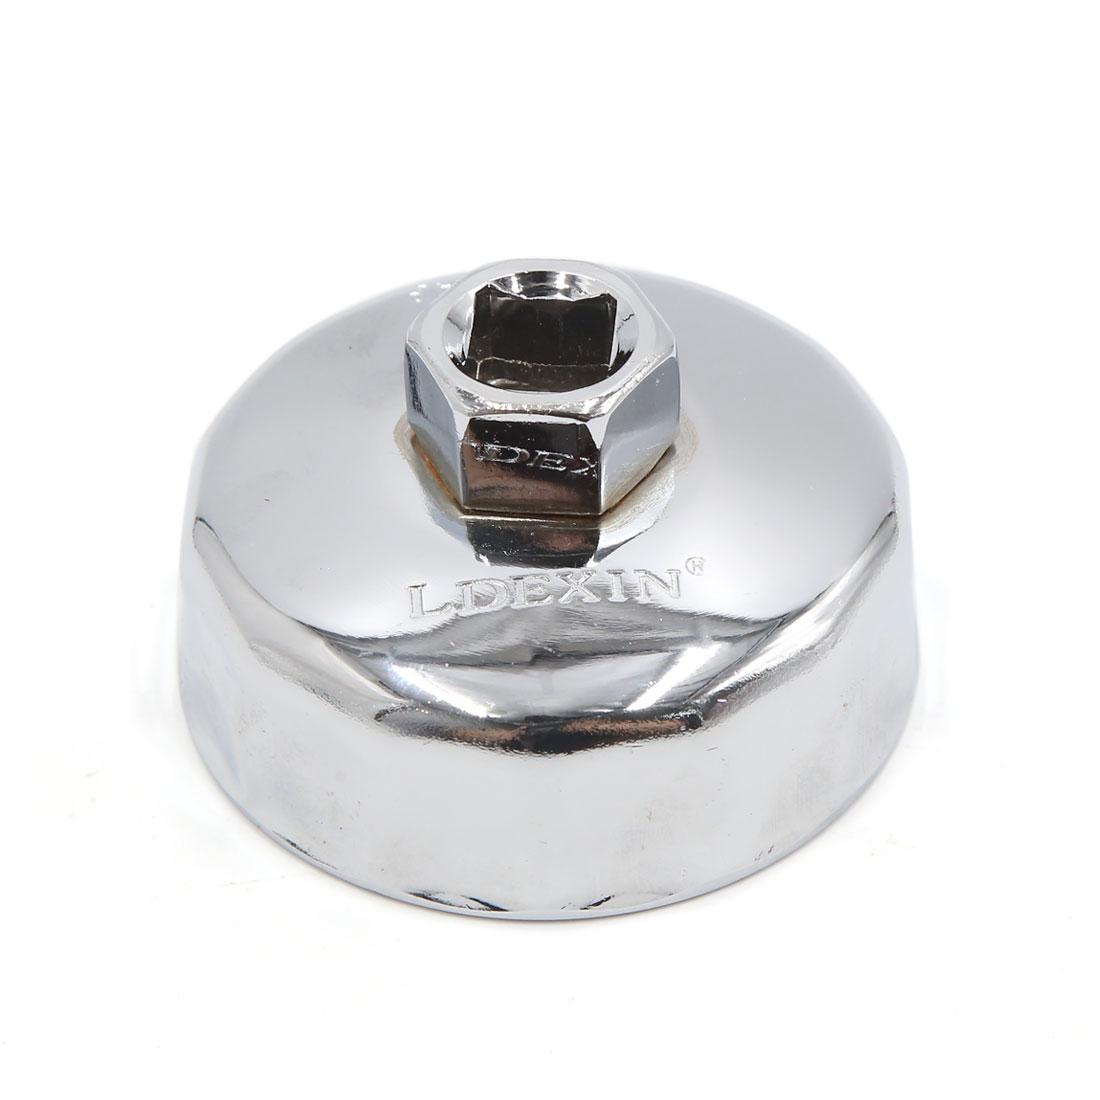 13mm Square Socket 14 Flutes 67mm Inside Diameter Cap-Type Oil Filter Wrench Spanner for Car Vehicle